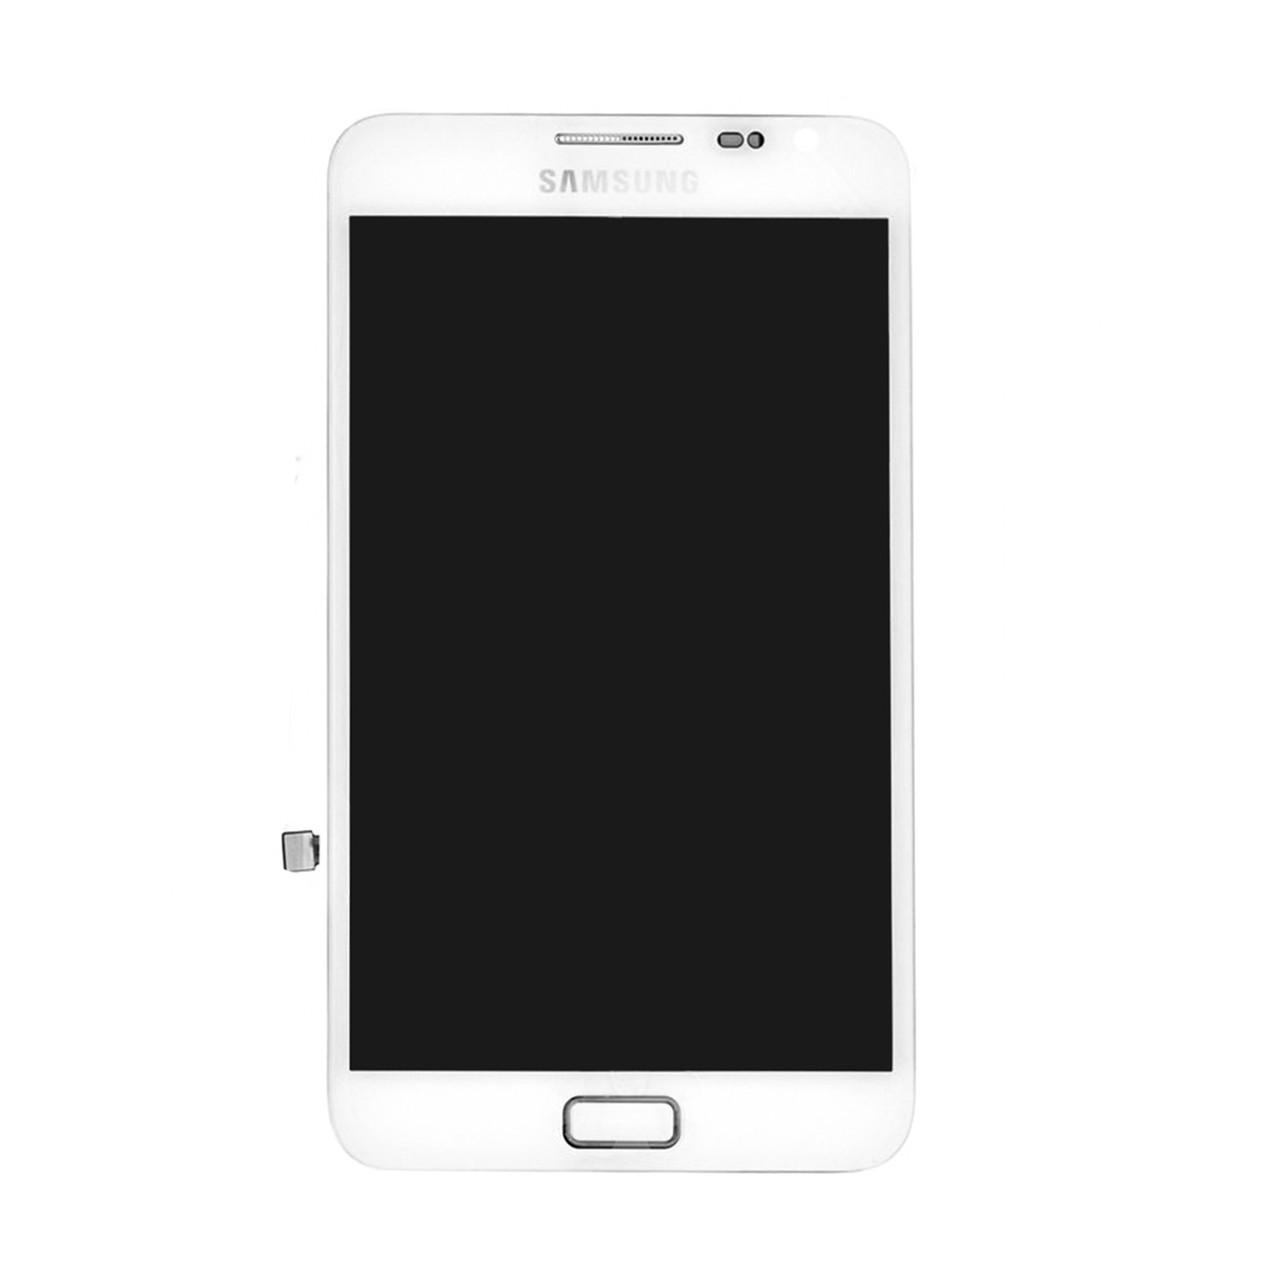 Дисплей Samsung Galaxy Note 1 N7000/i9220 в сборе White (21)